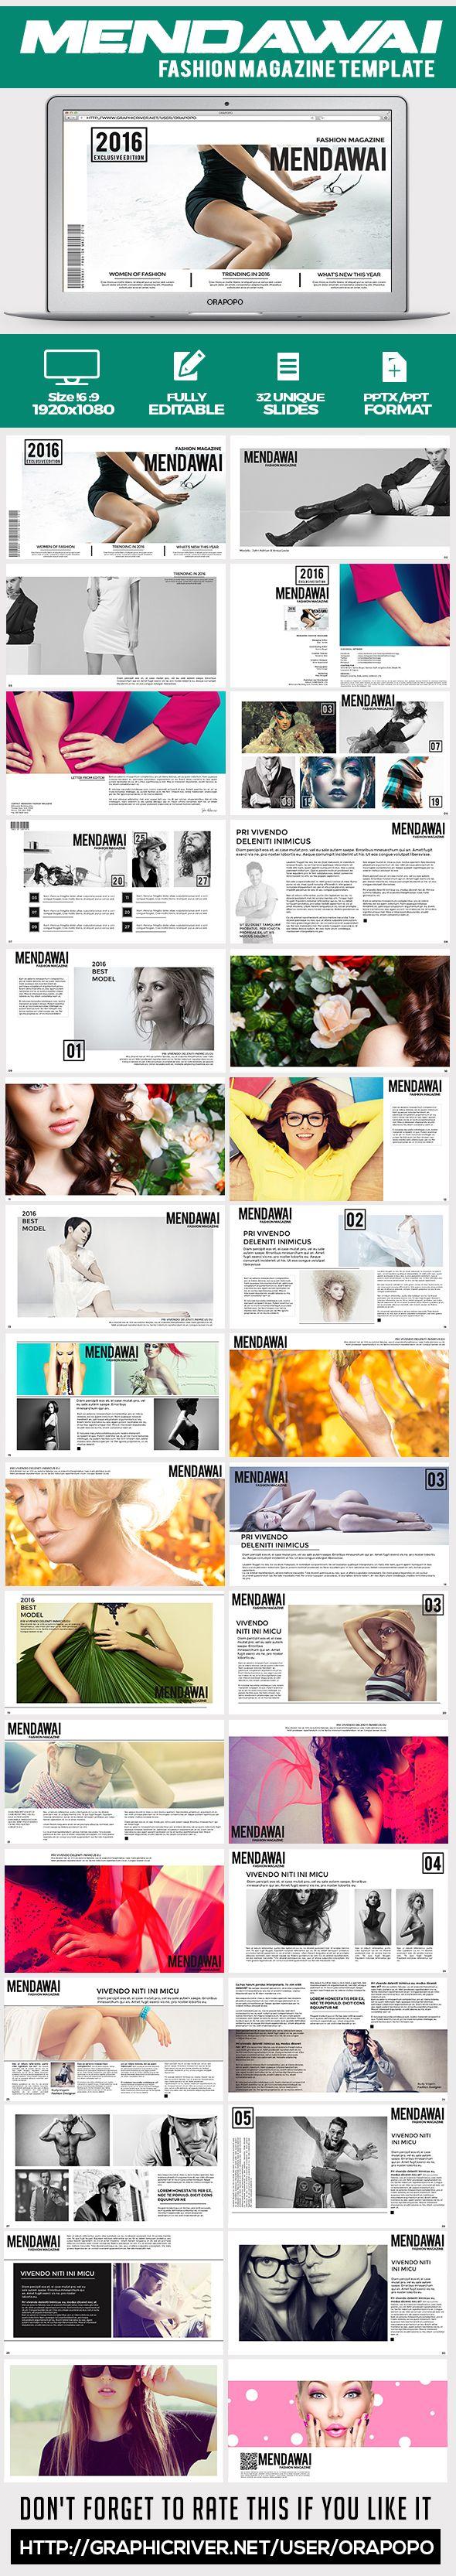 Mendawai fashion magazine template fashion portfolio template mendawai fashion magazine template alramifo Gallery